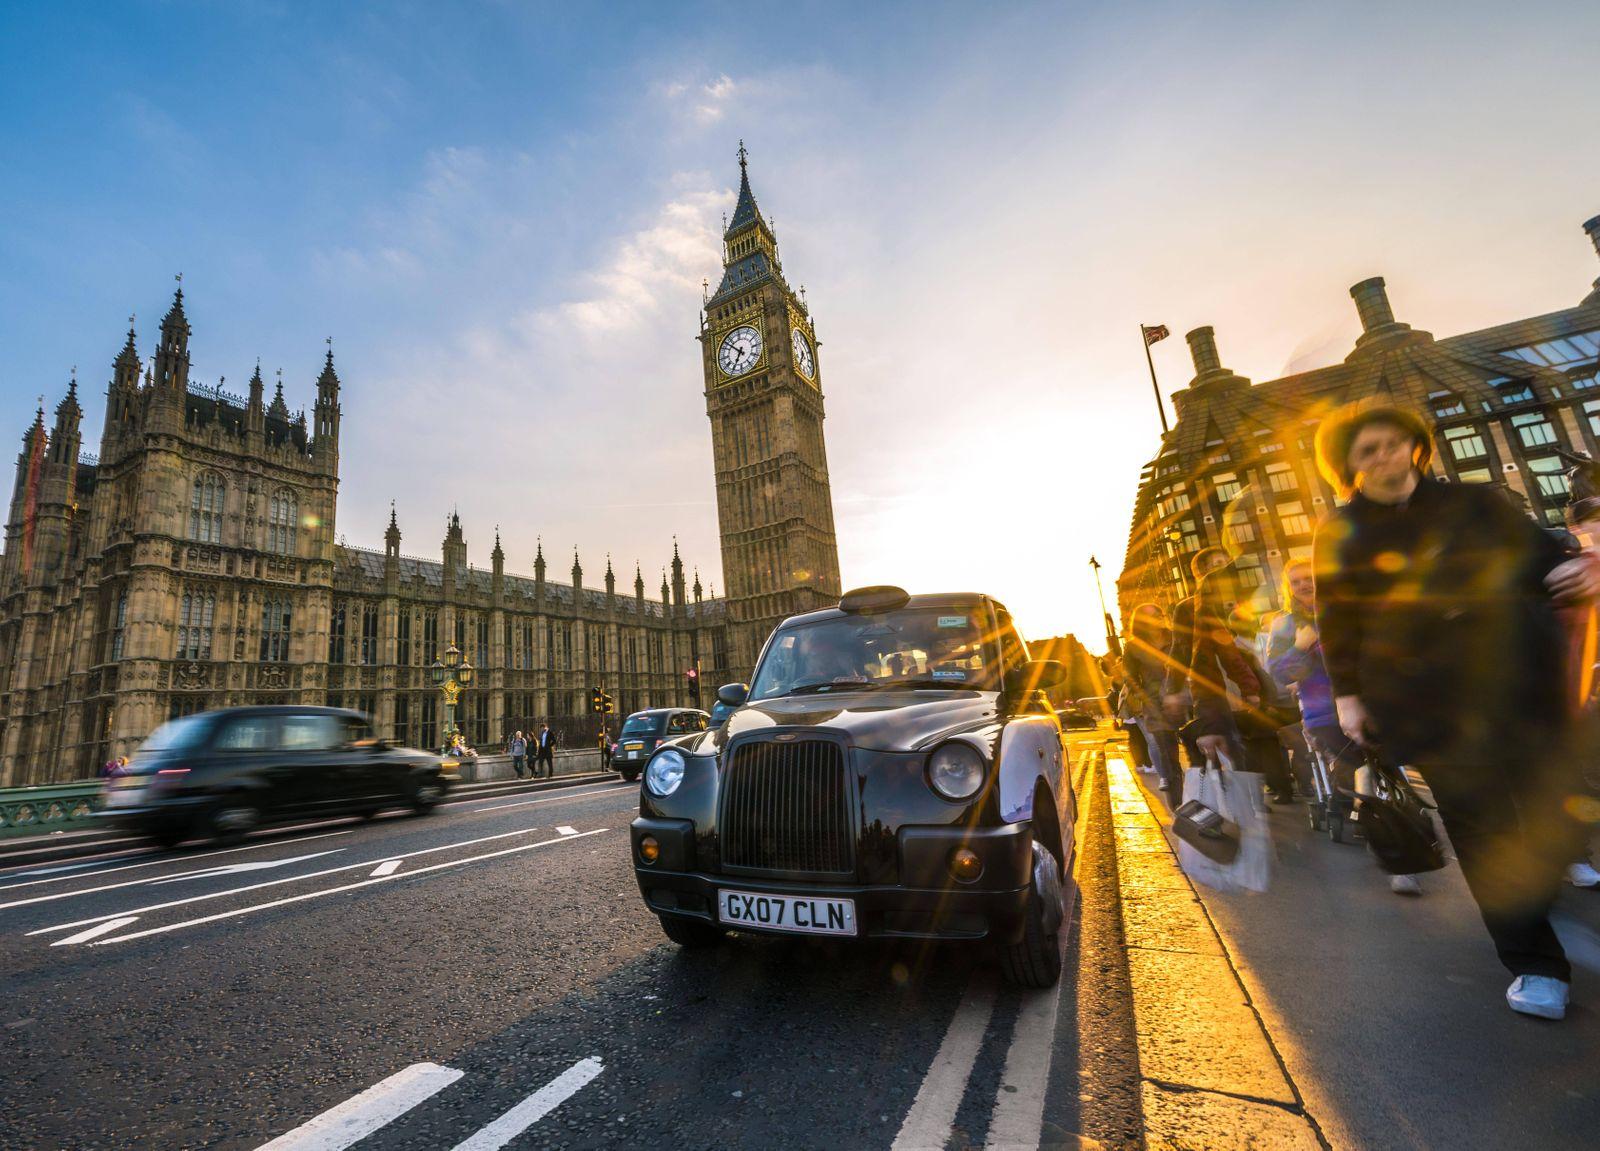 Schwarzes Taxi Black Cab vor Big Ben Houses of Parliament Westminster Bridge Sonnenuntergang Ge